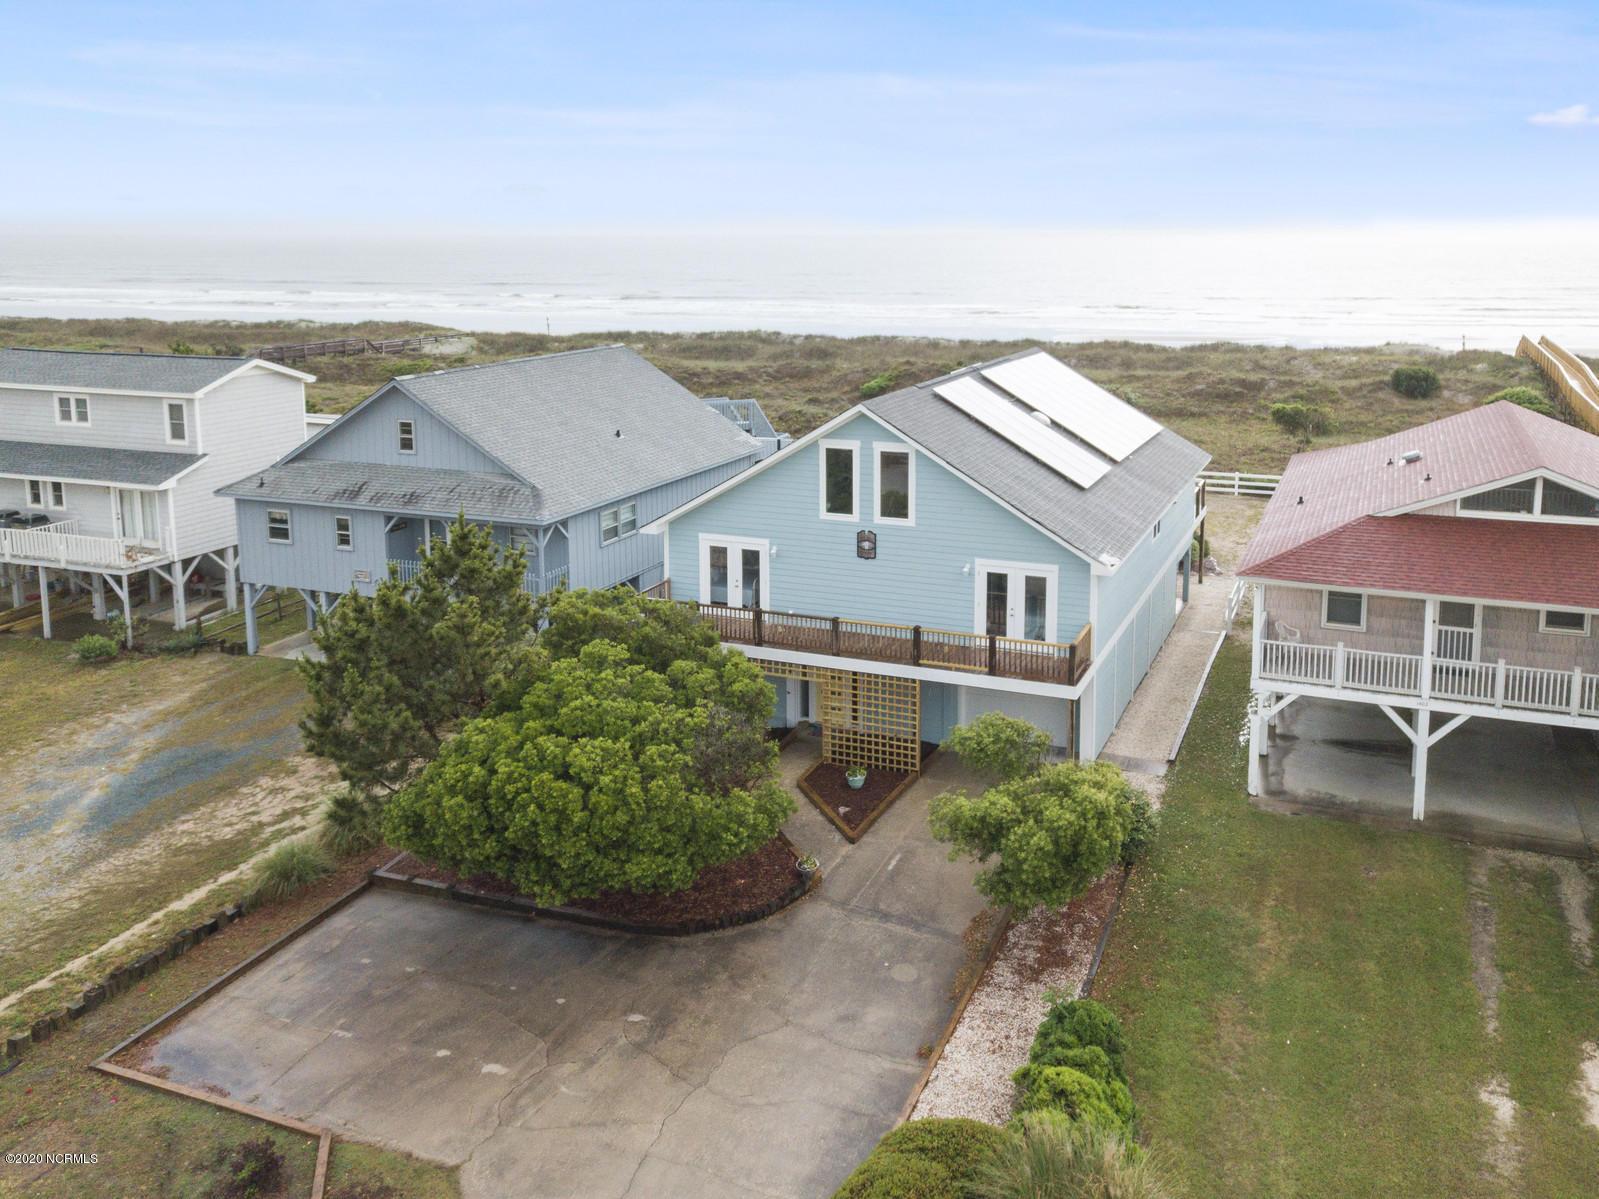 1404 Main Street, Sunset Beach, North Carolina 28468, 5 Bedrooms Bedrooms, 7 Rooms Rooms,3 BathroomsBathrooms,Single family residence,For sale,Main,100219038